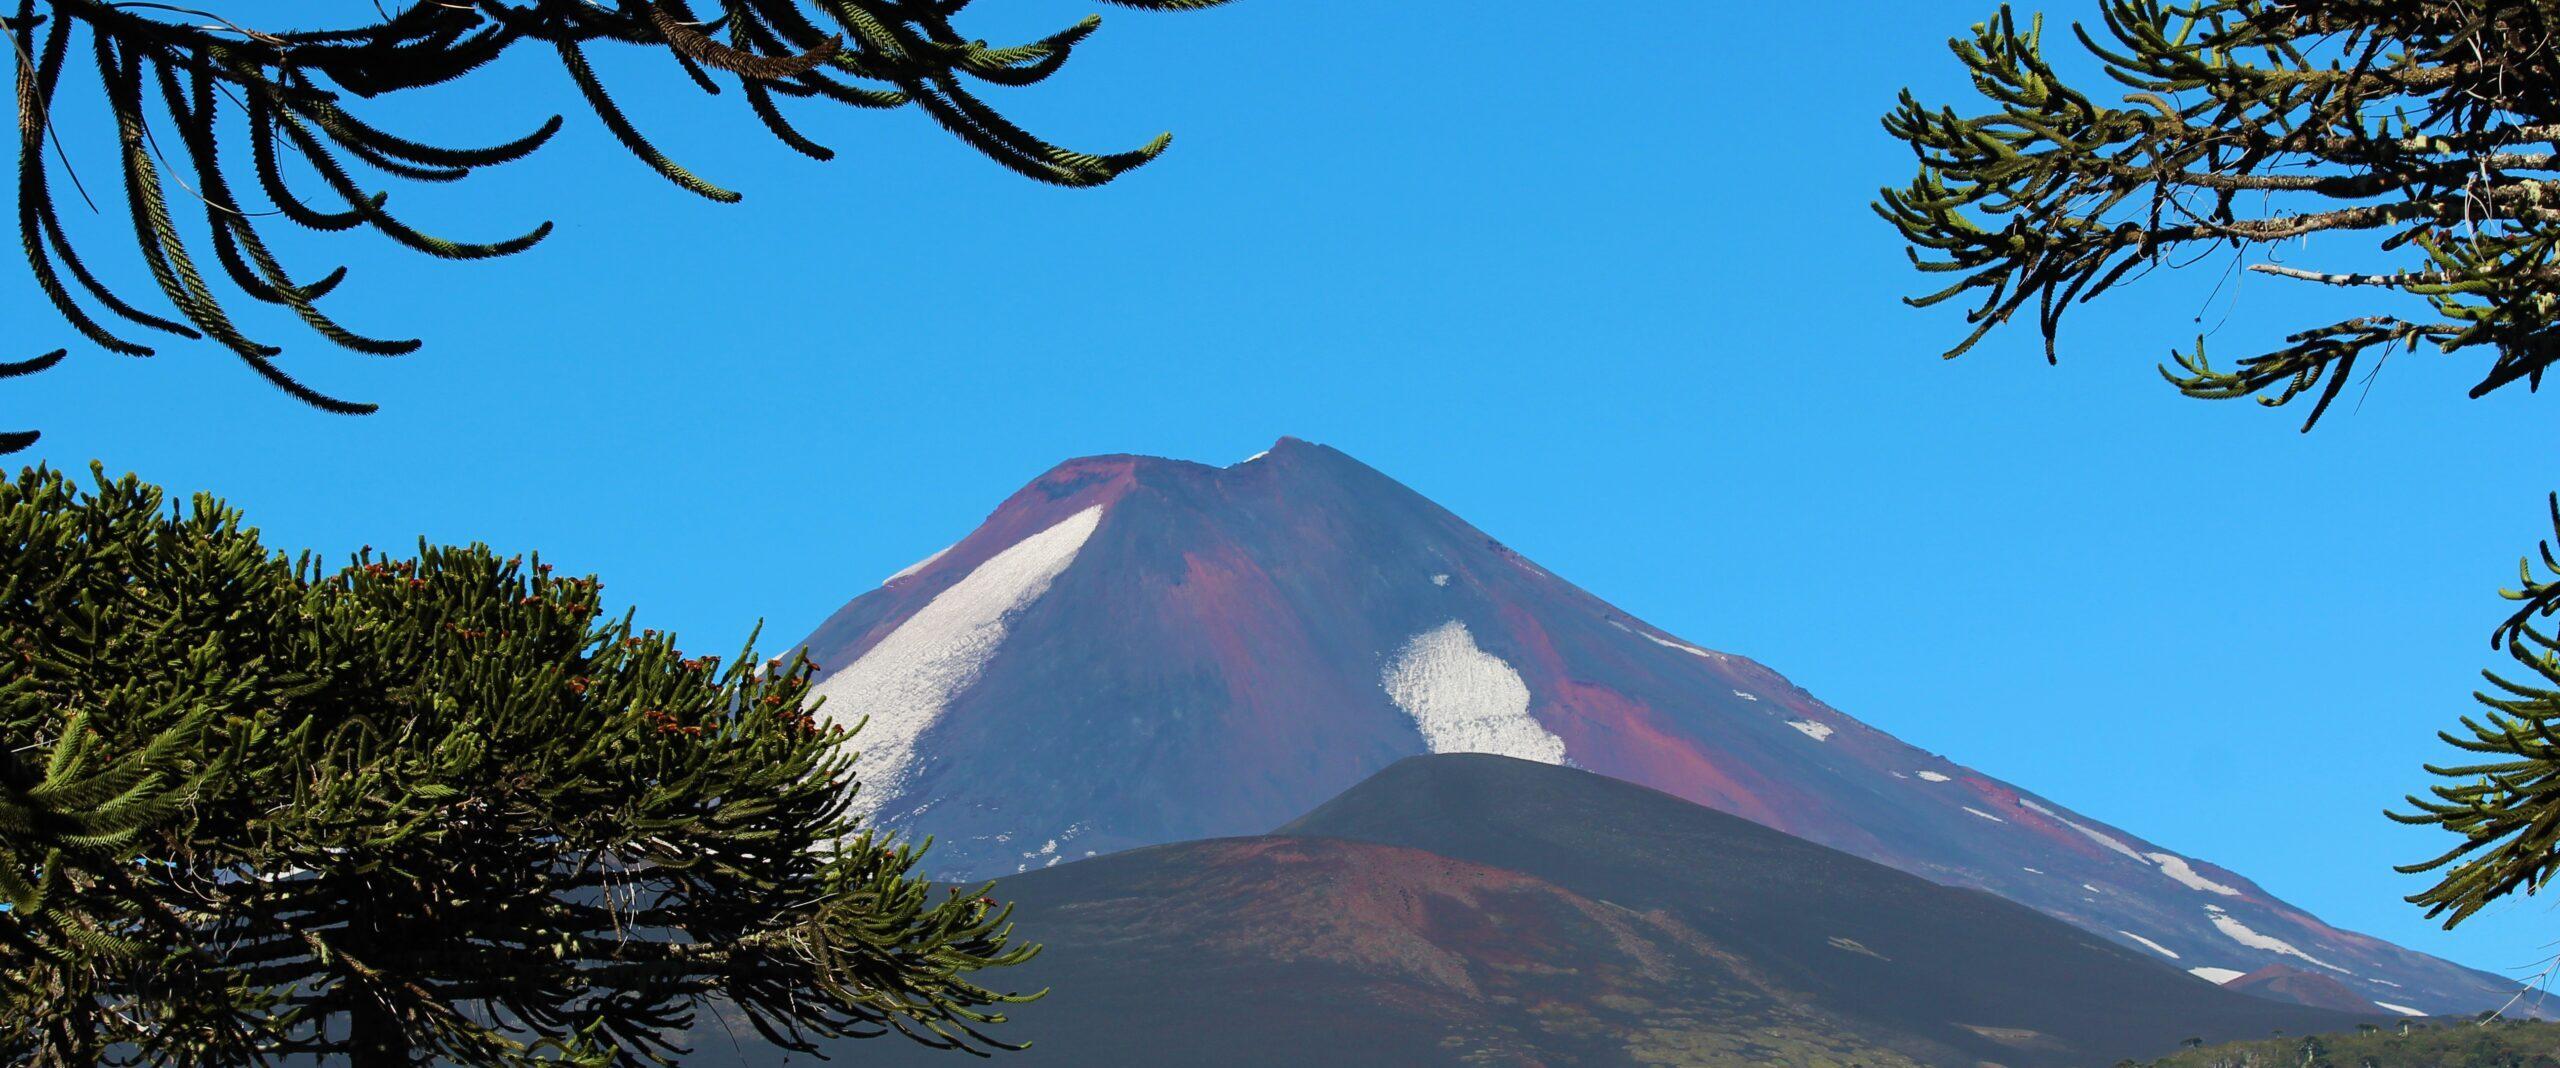 11 – Vulkane und Araukarien begleiten uns